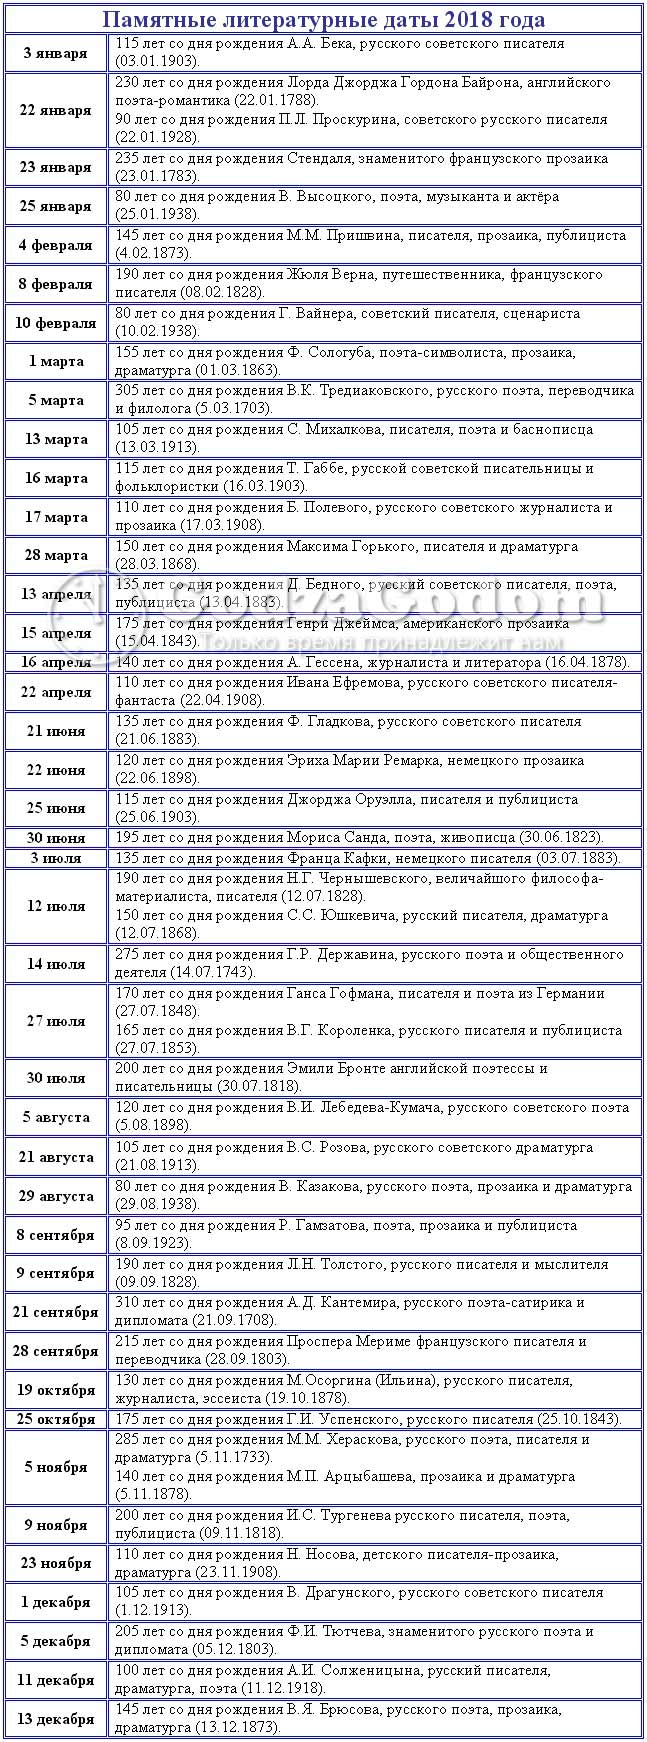 Календарь памятных литературных дат 2018 года